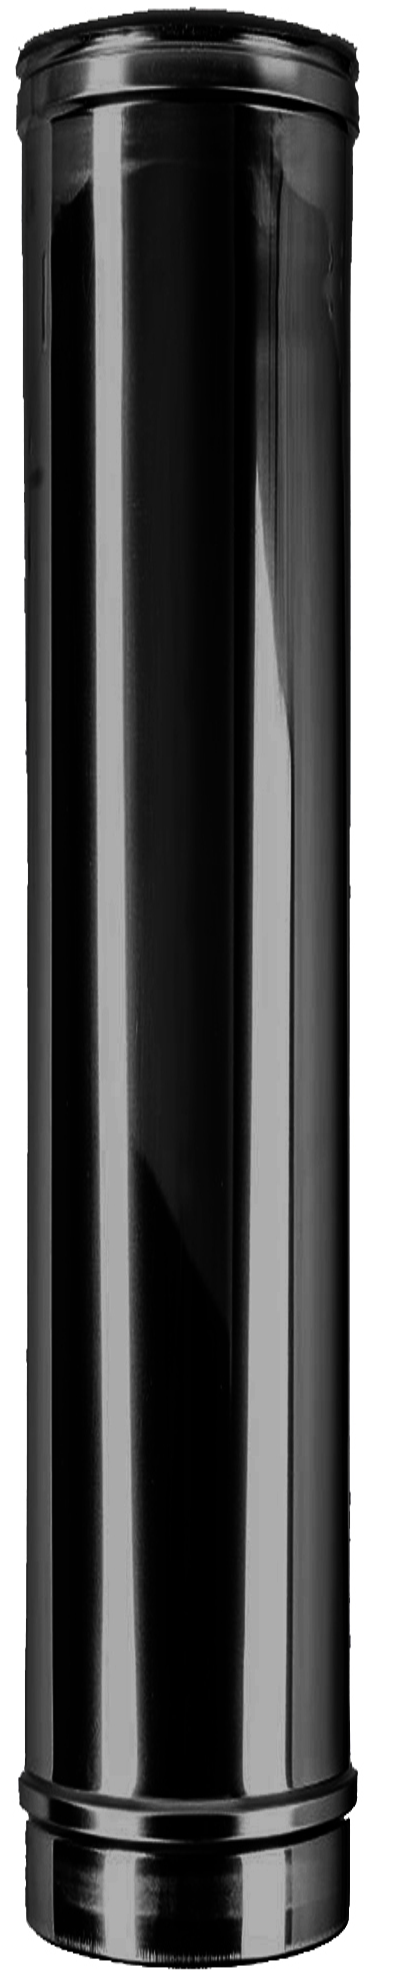 l-ngenelement-1000-mm-schwarz